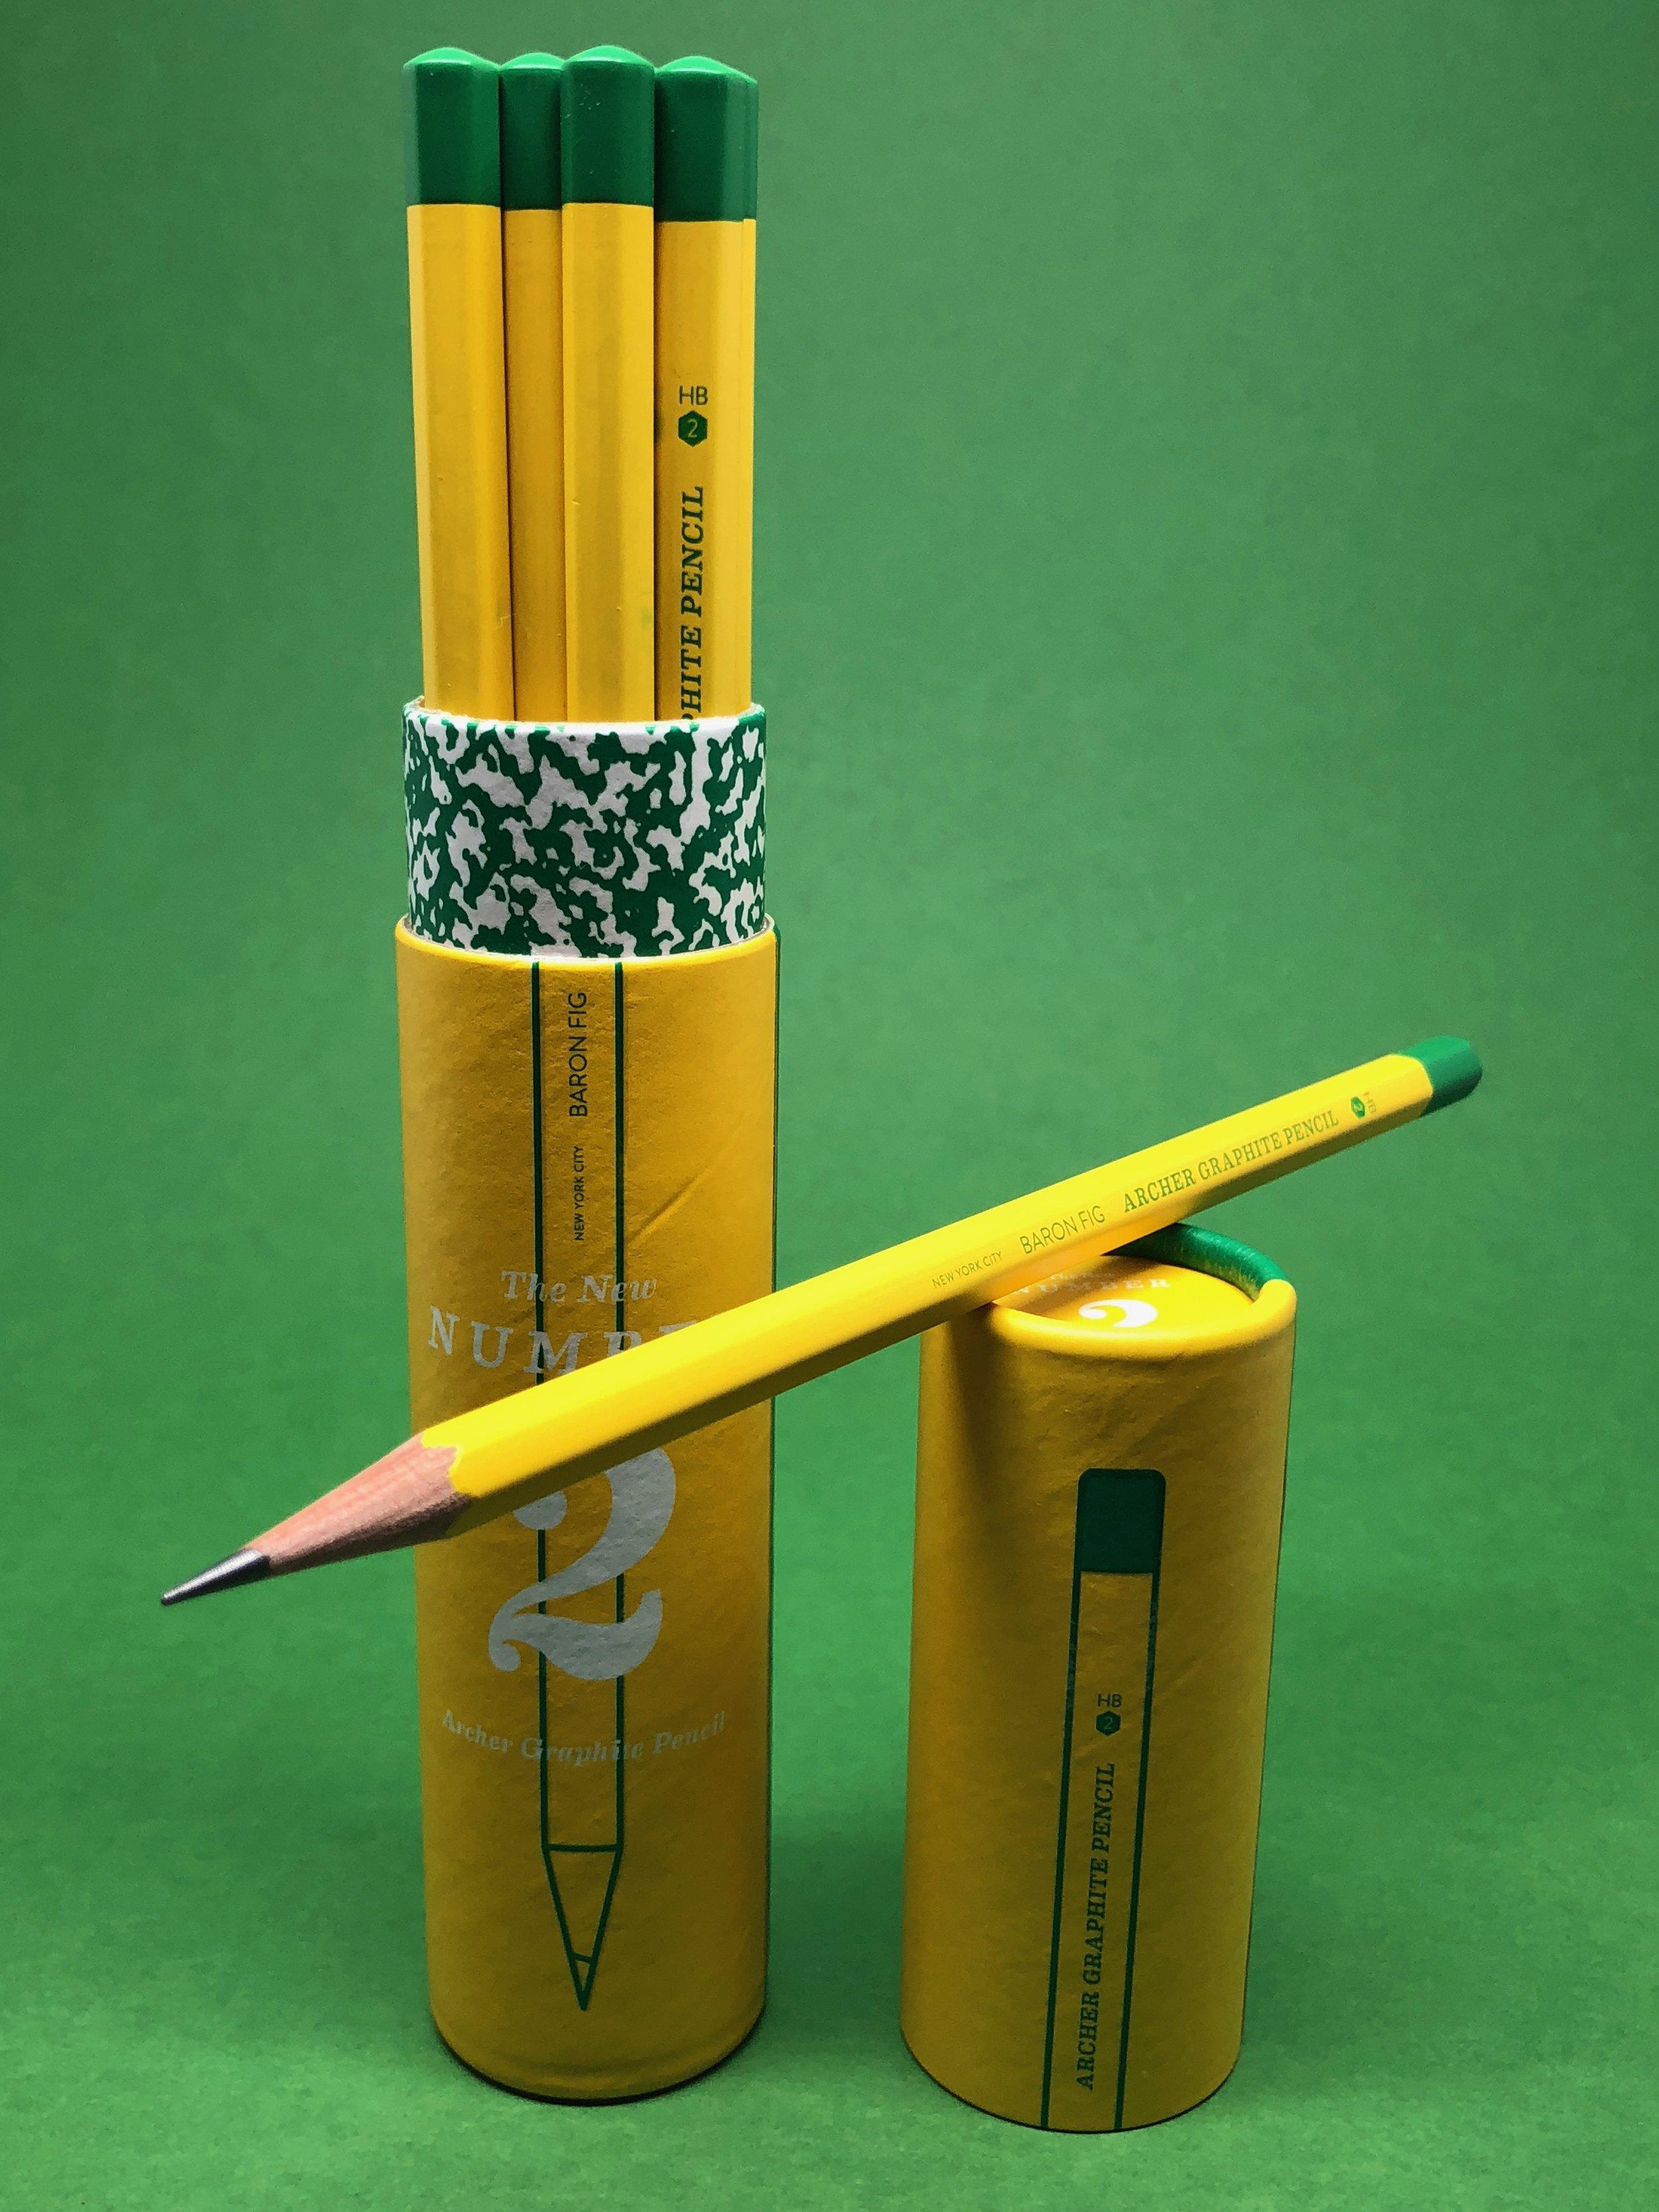 baron-fig-archer-school-pencil-5.jpg